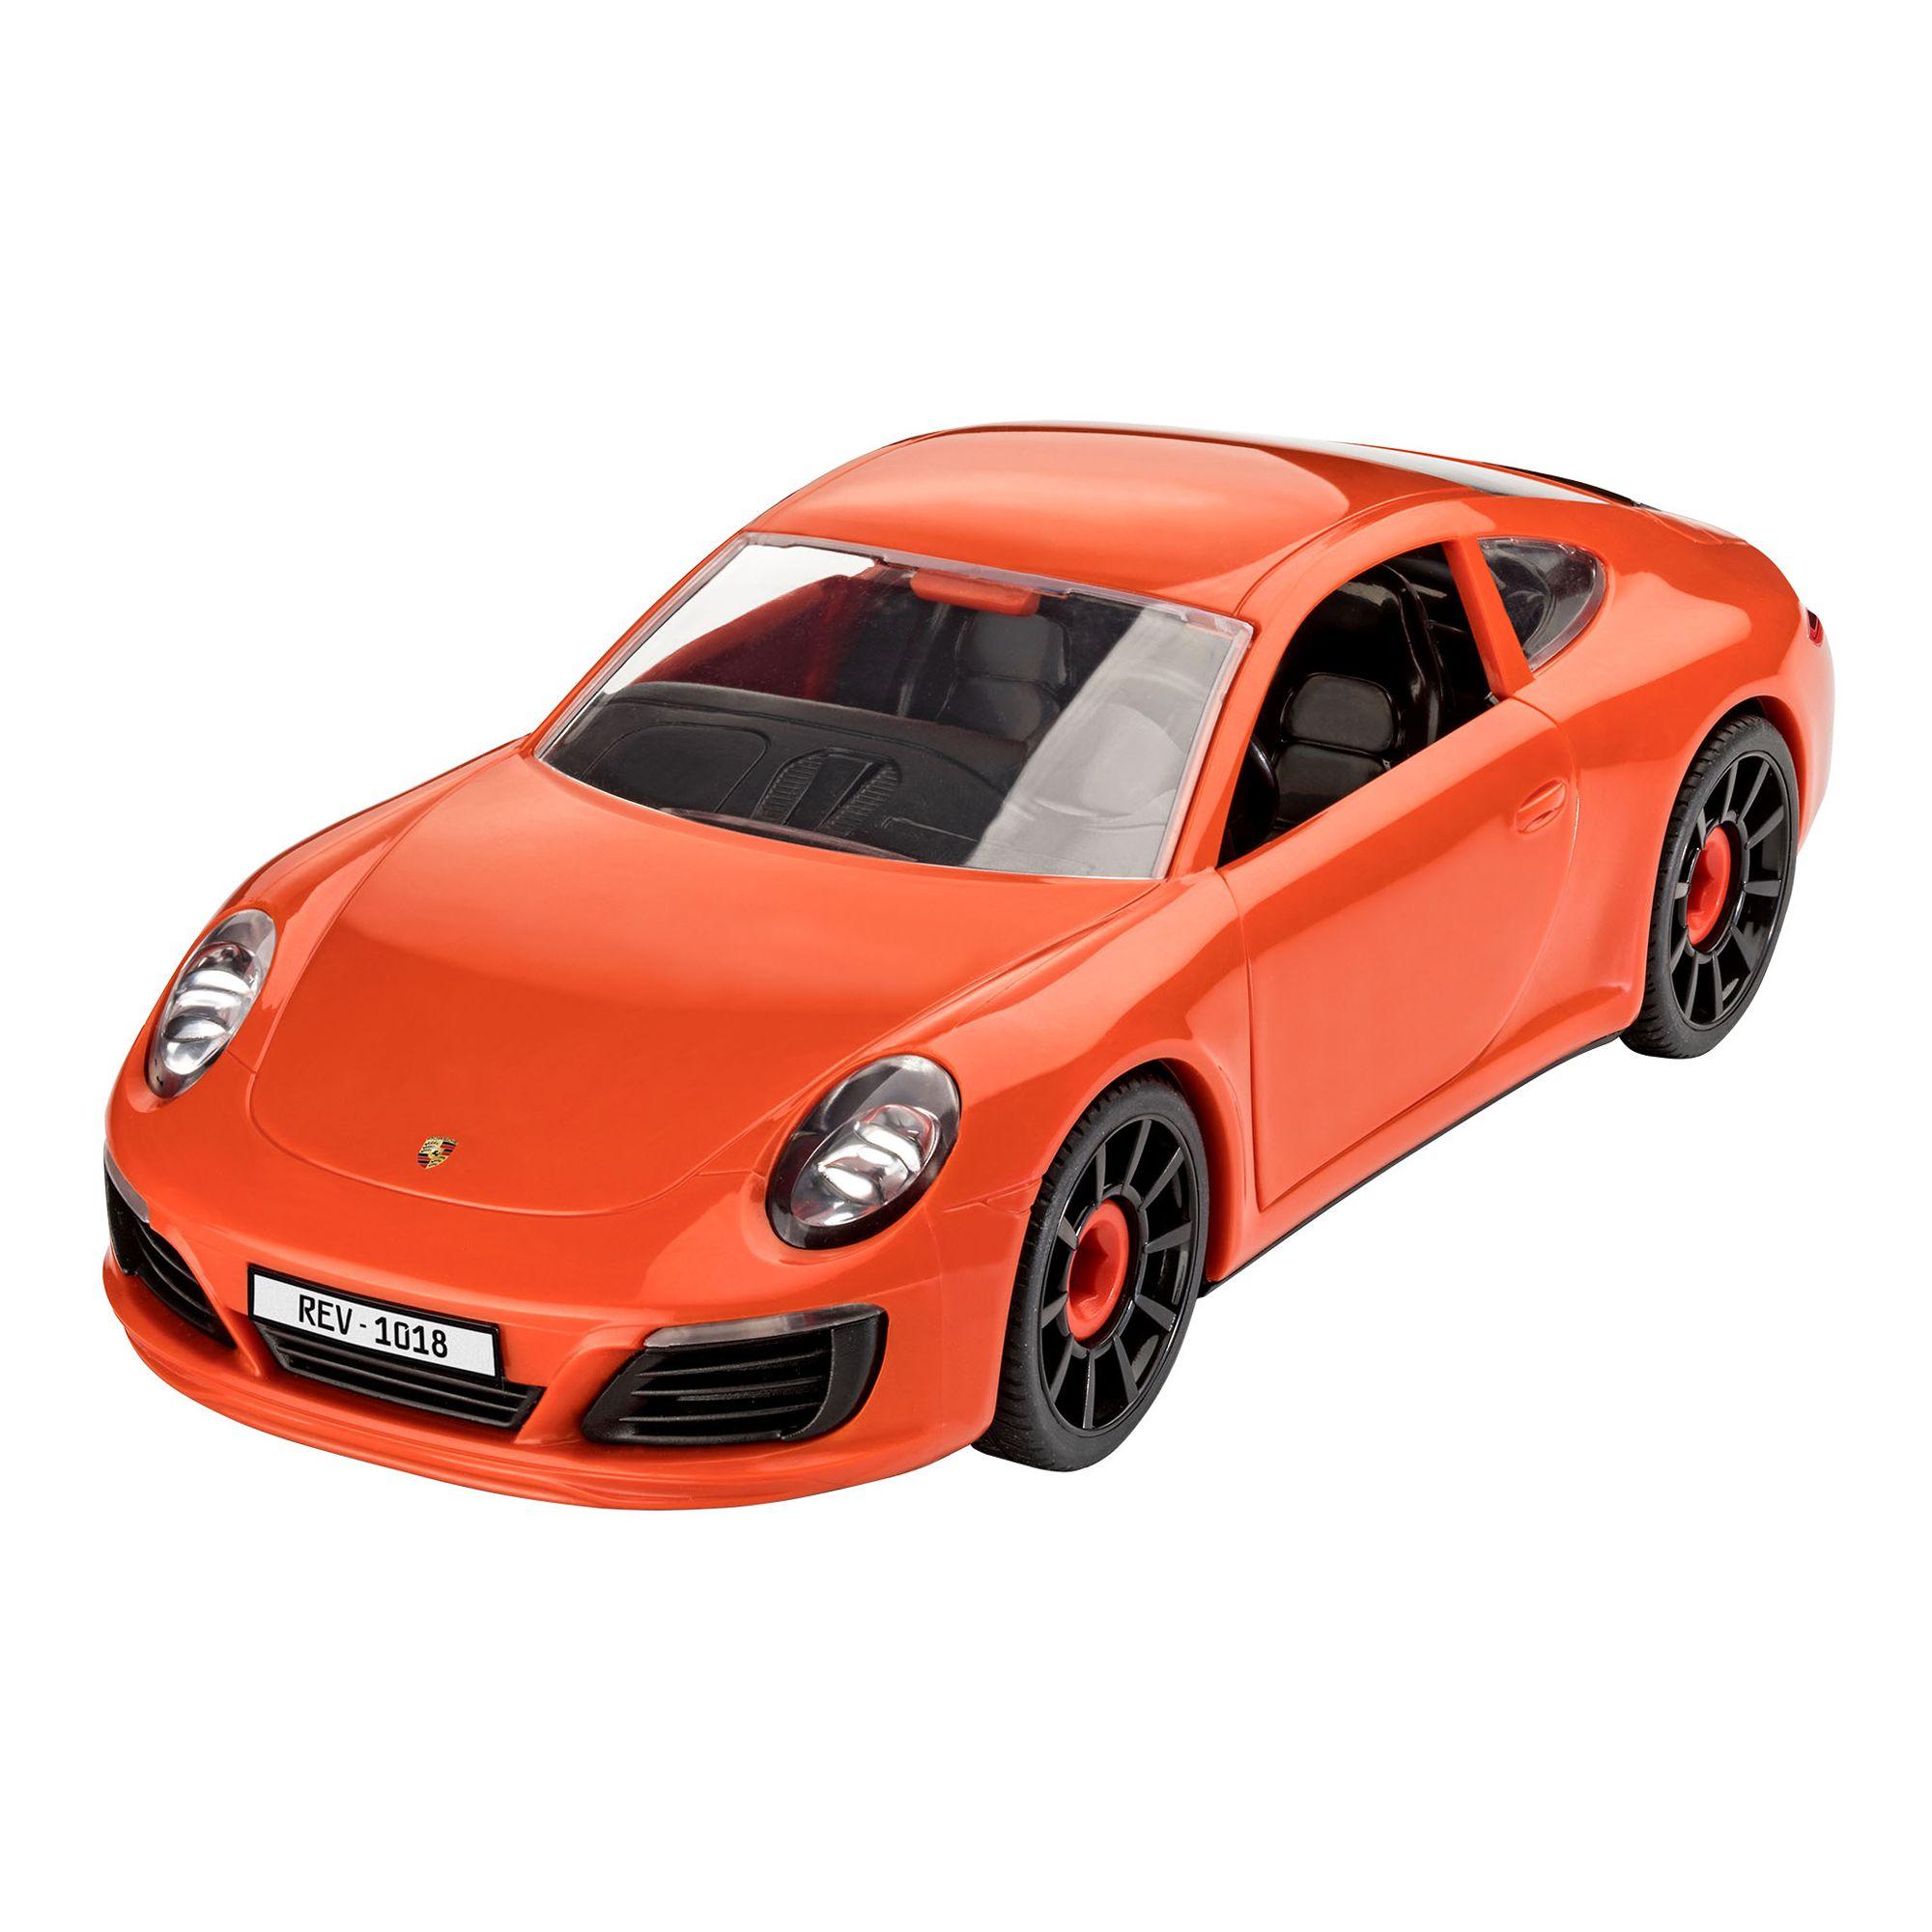 Revell Weihnachtskalender.Revell Junior Kit Porsche 911 Adventskalender Ab 4 Jahren Qvc De